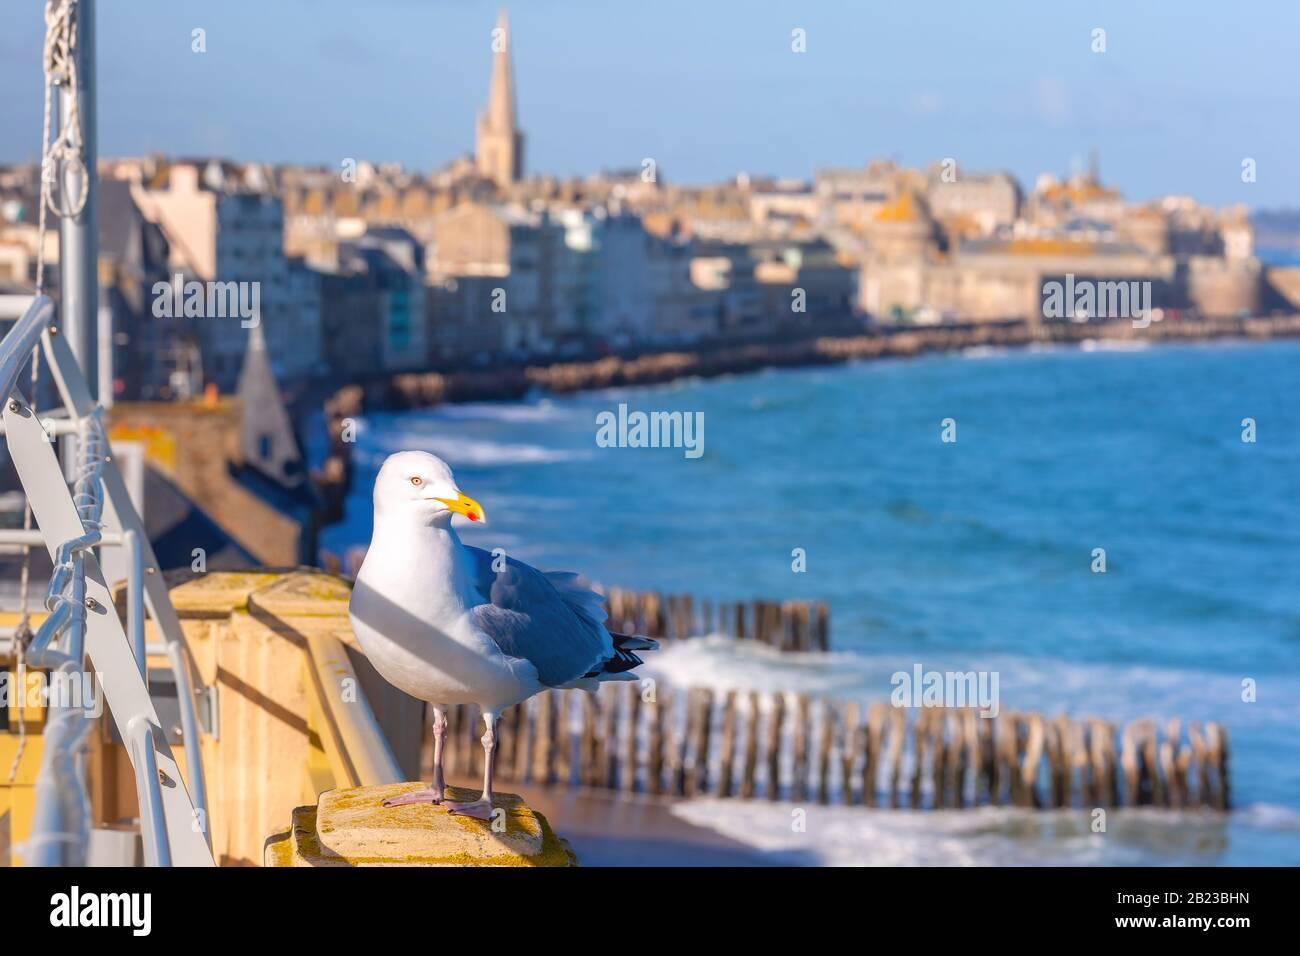 Saint Malo (aerial View) Immagini e Fotos Stock - Alamy